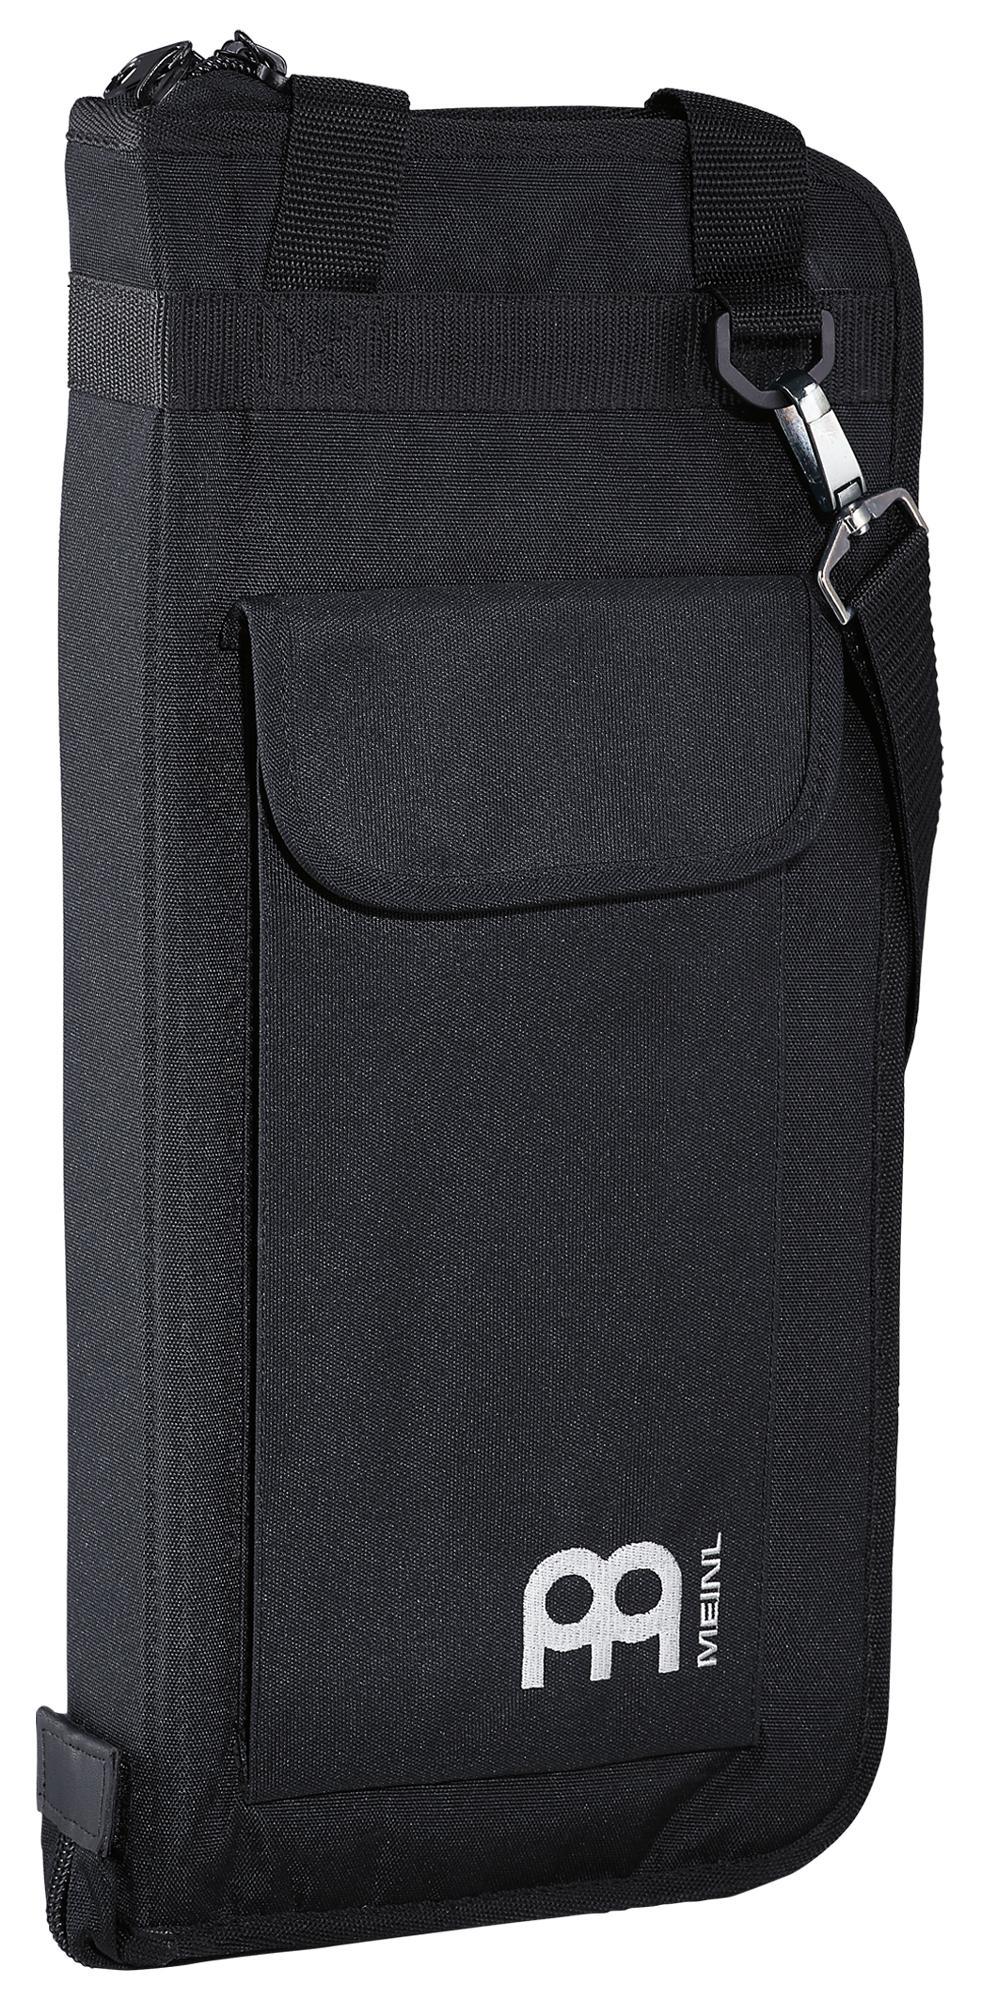 Meinl MSB 1 Professional Stick Bag Black